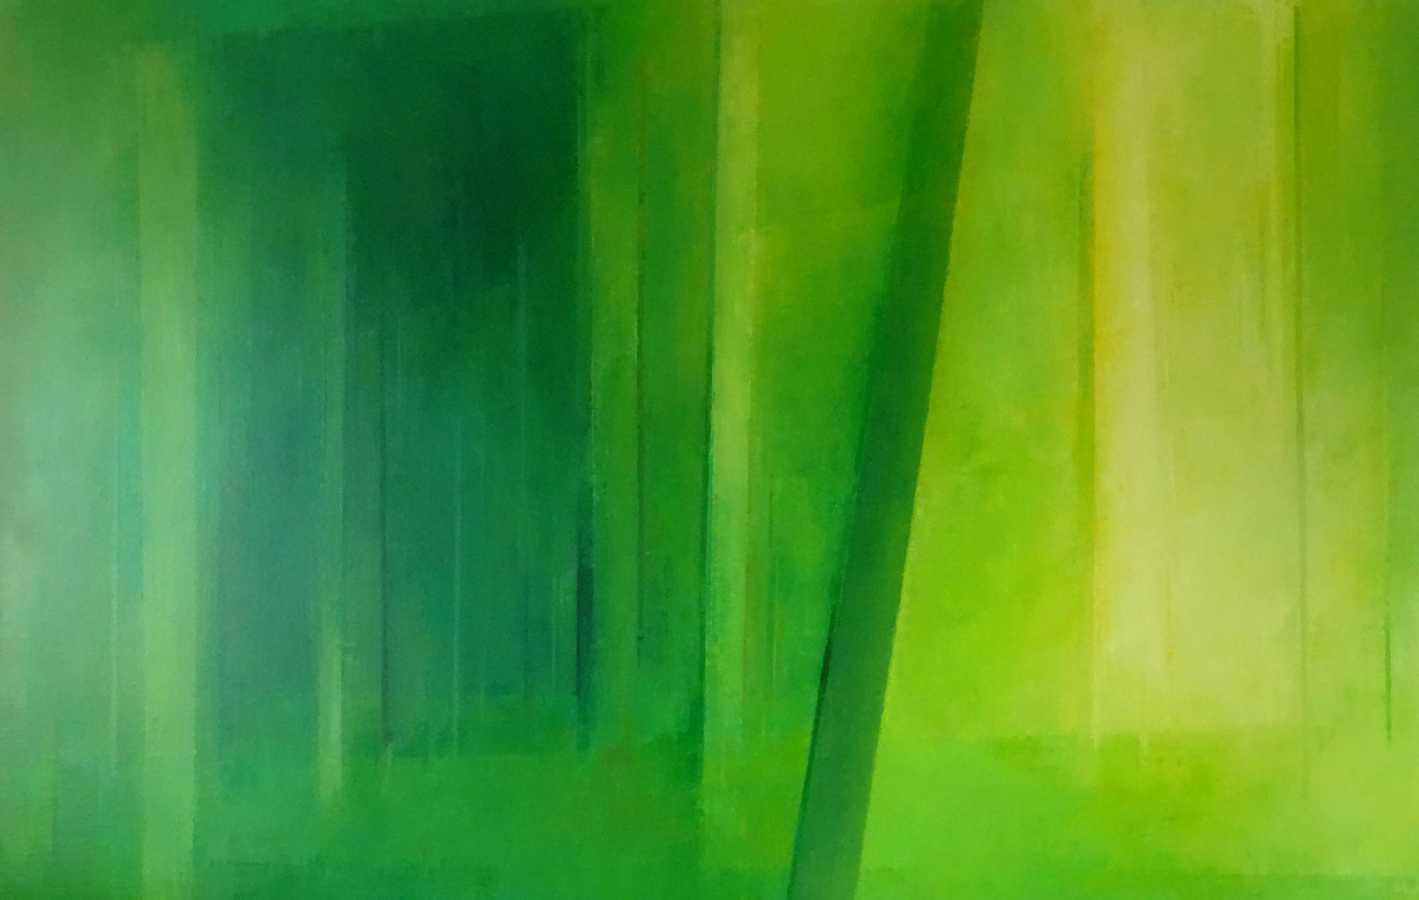 Karsch Manfred alkotása, 2010